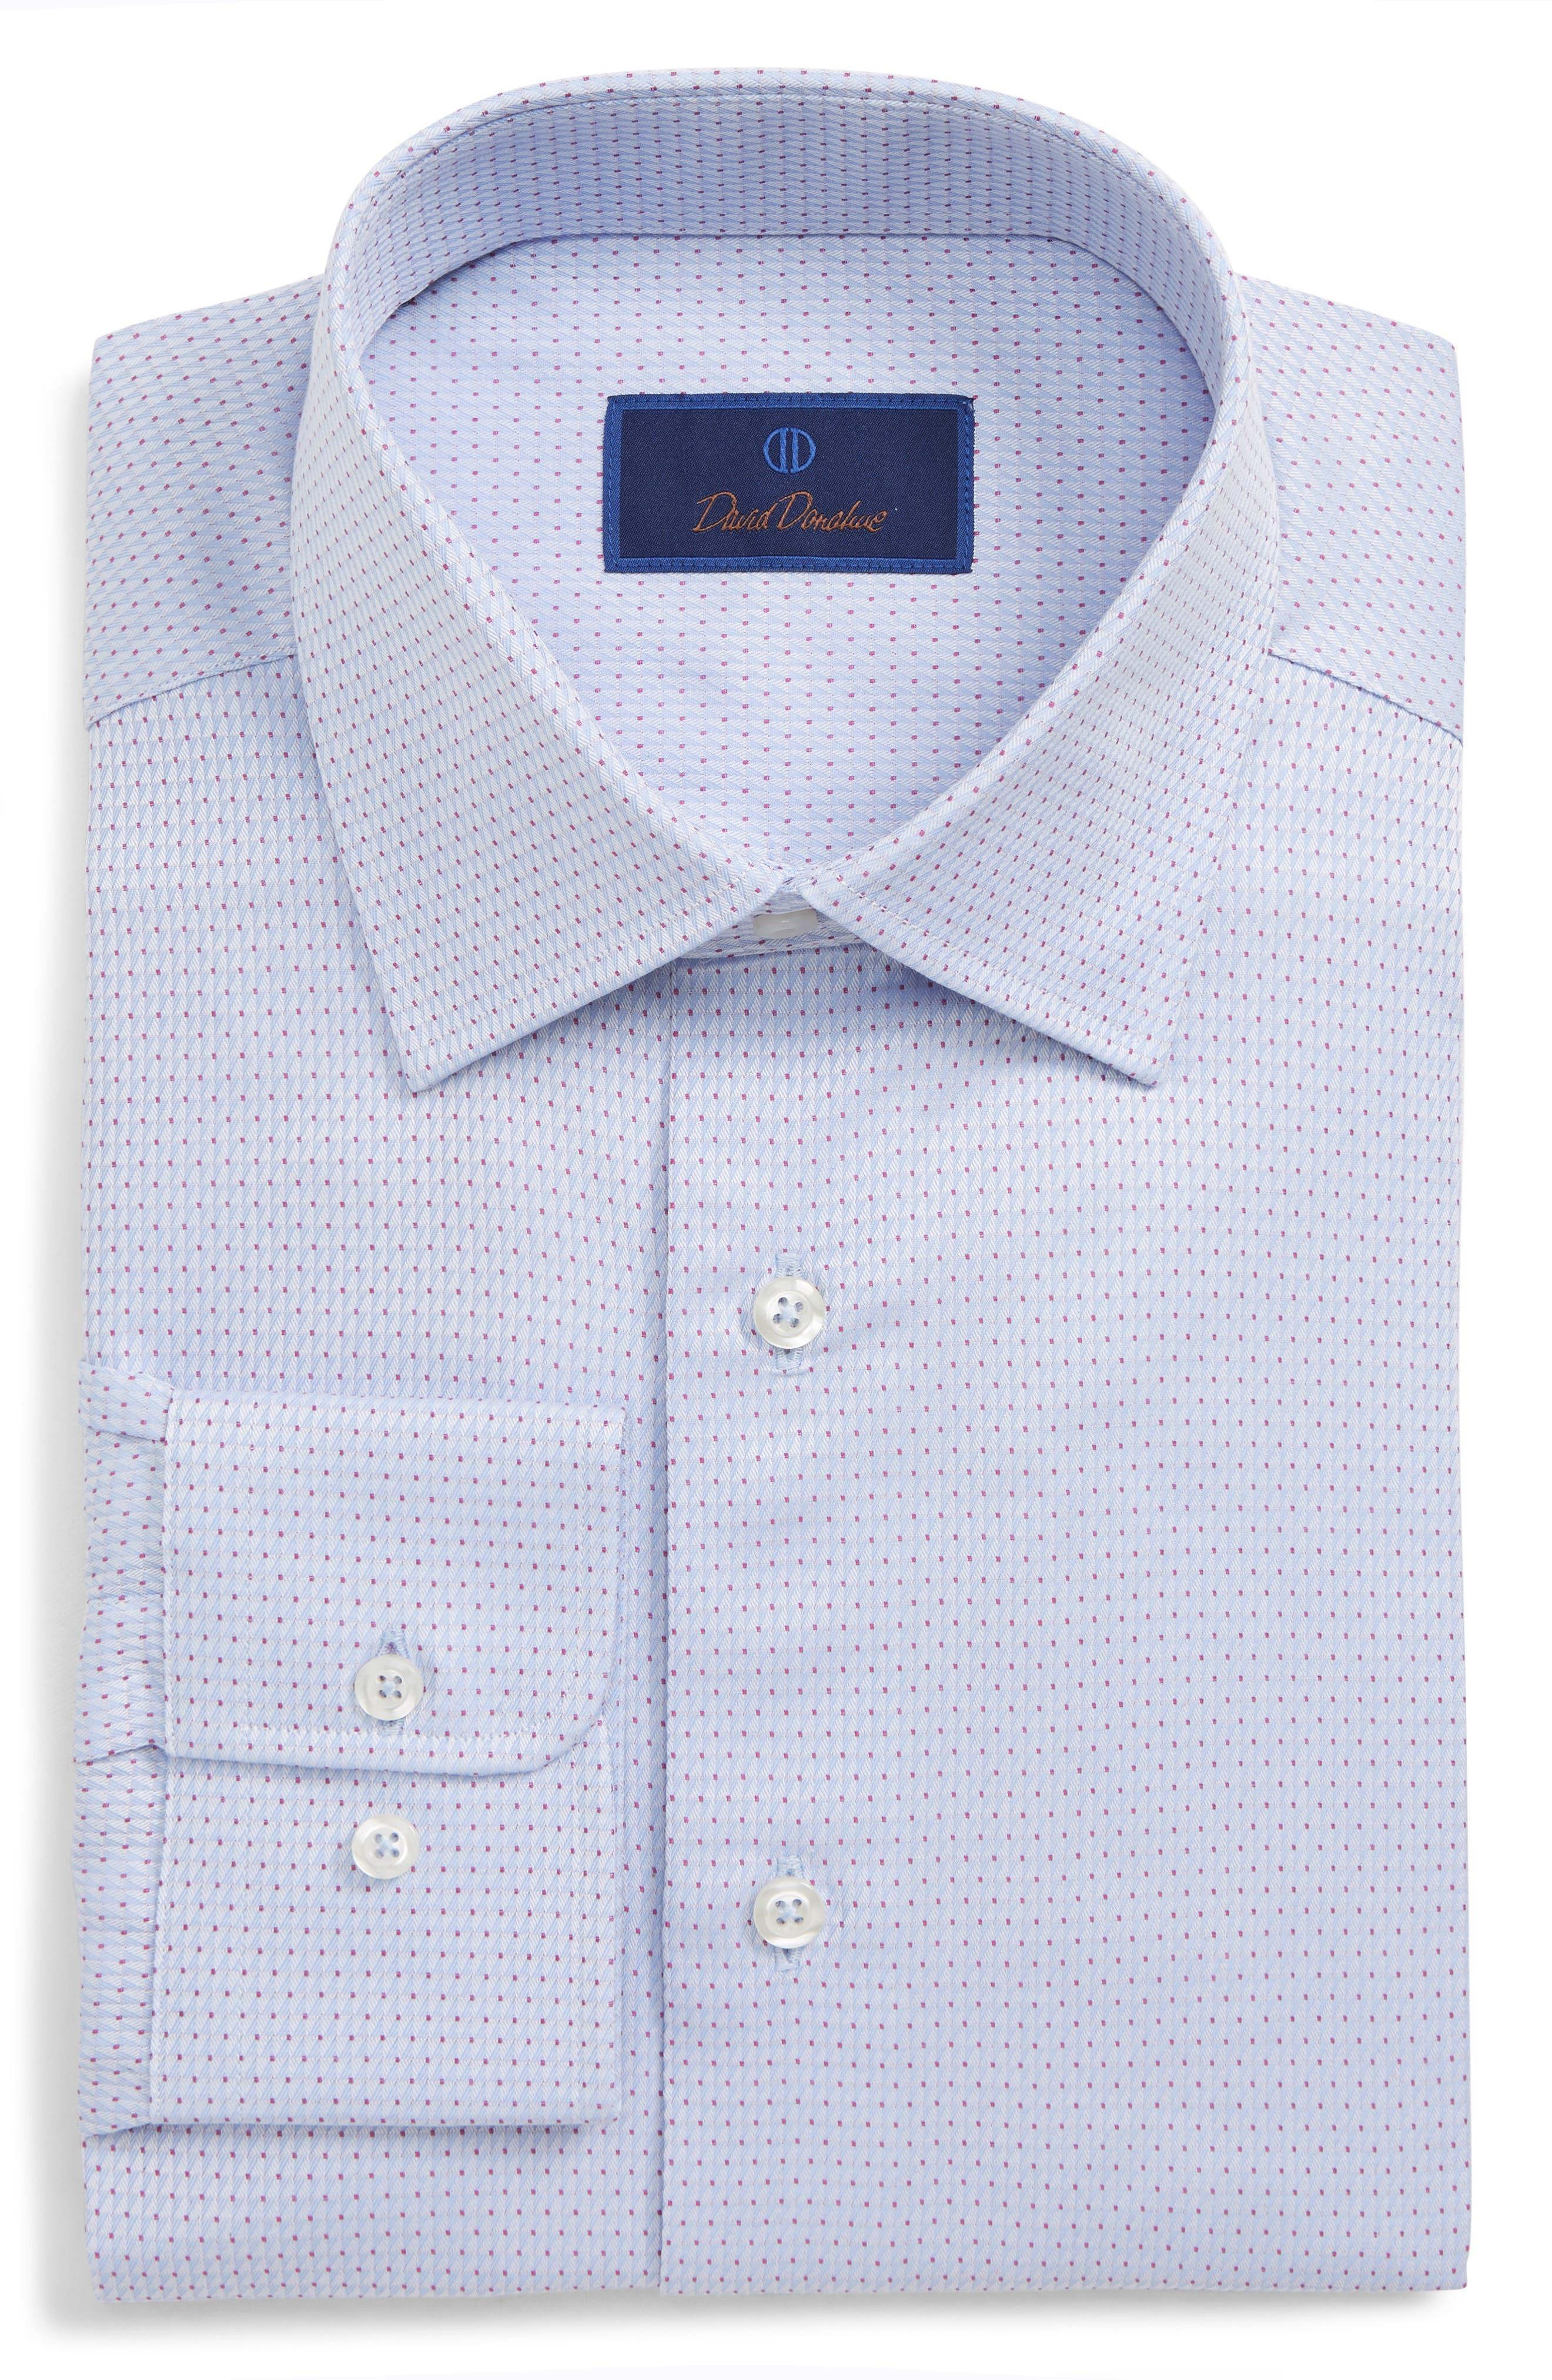 Regular Fit Geometric Dress Shirt,                             Main thumbnail 1, color,                             SKY/ BERRY